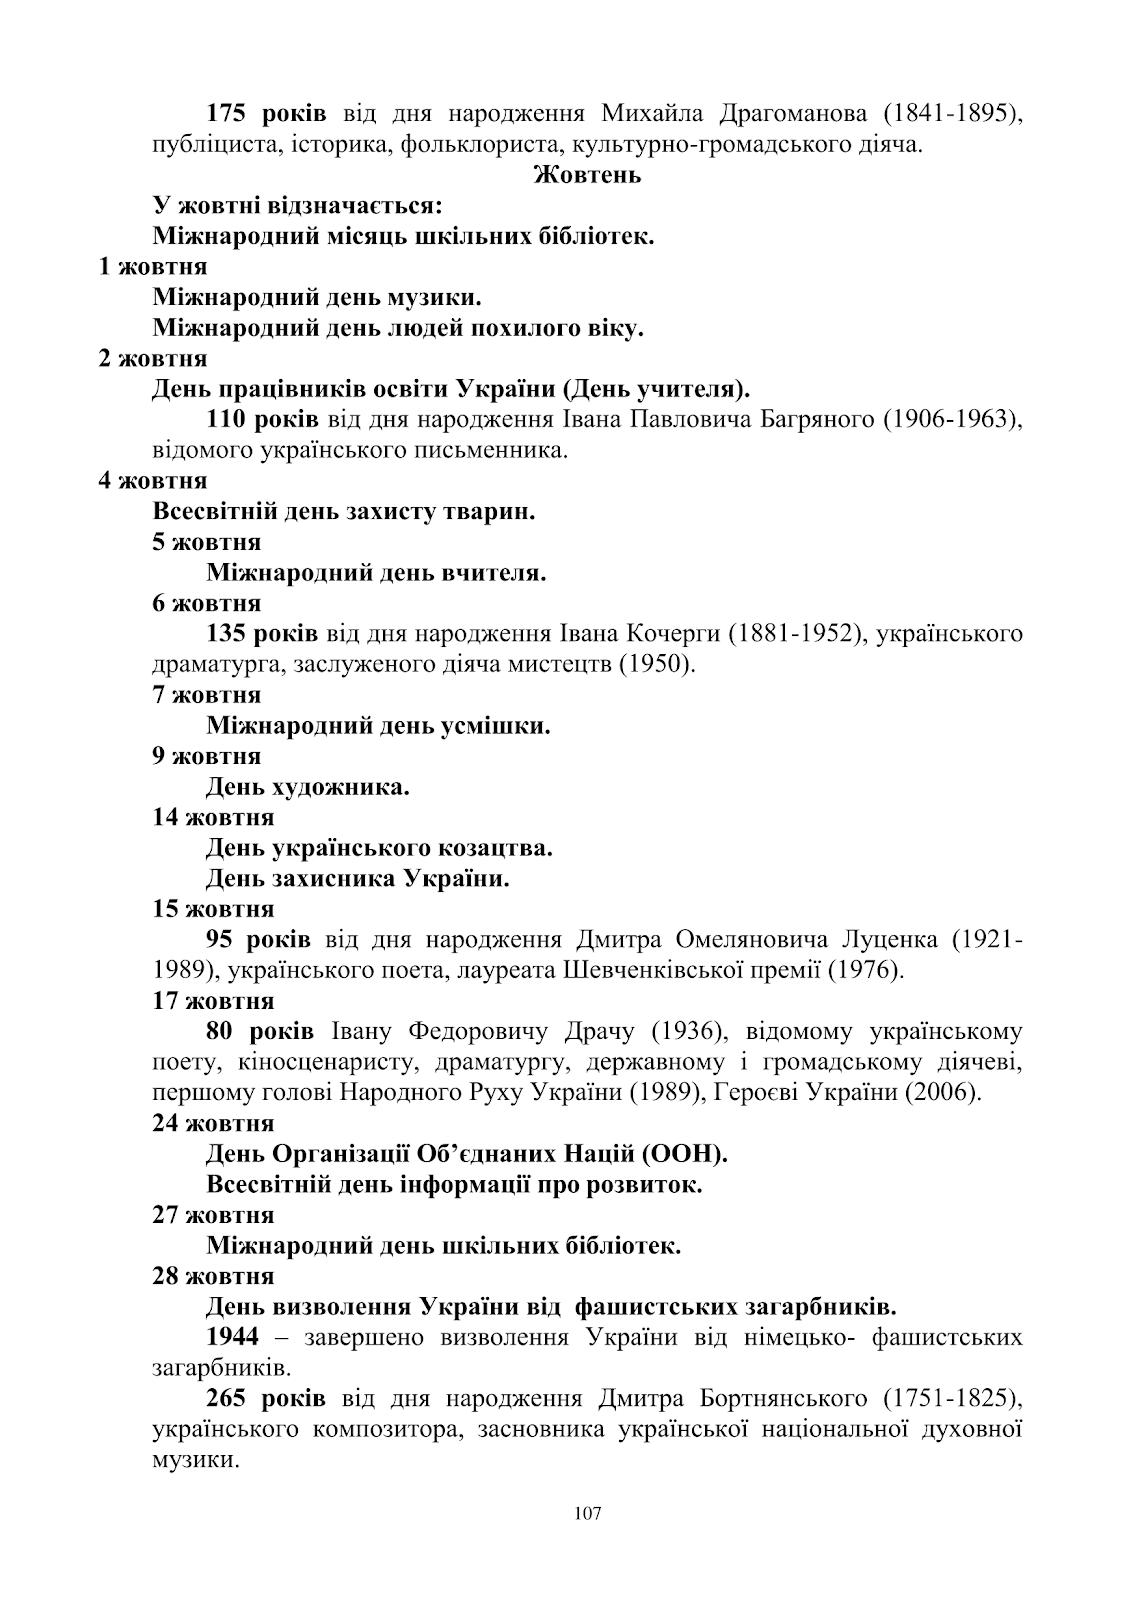 C:\Users\Валерия\Desktop\план 2016 рік\план 2016 рік-107.png